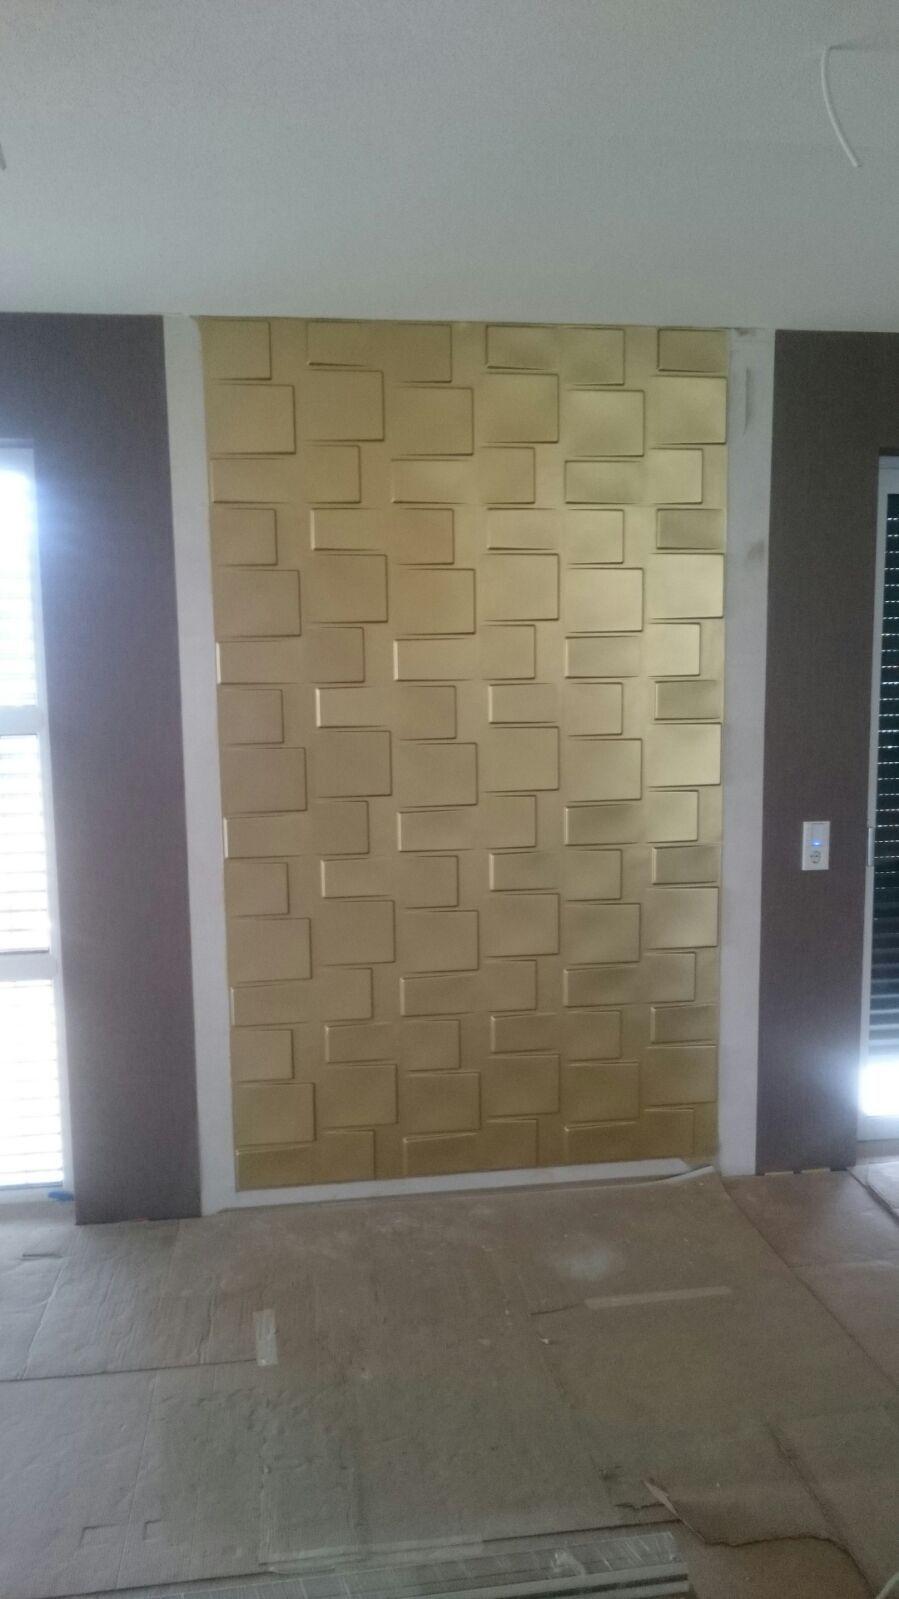 wandfarbe pur gold effekt wandeffekt kein glitter 1 liter gp 15 90 l eur 15 90. Black Bedroom Furniture Sets. Home Design Ideas